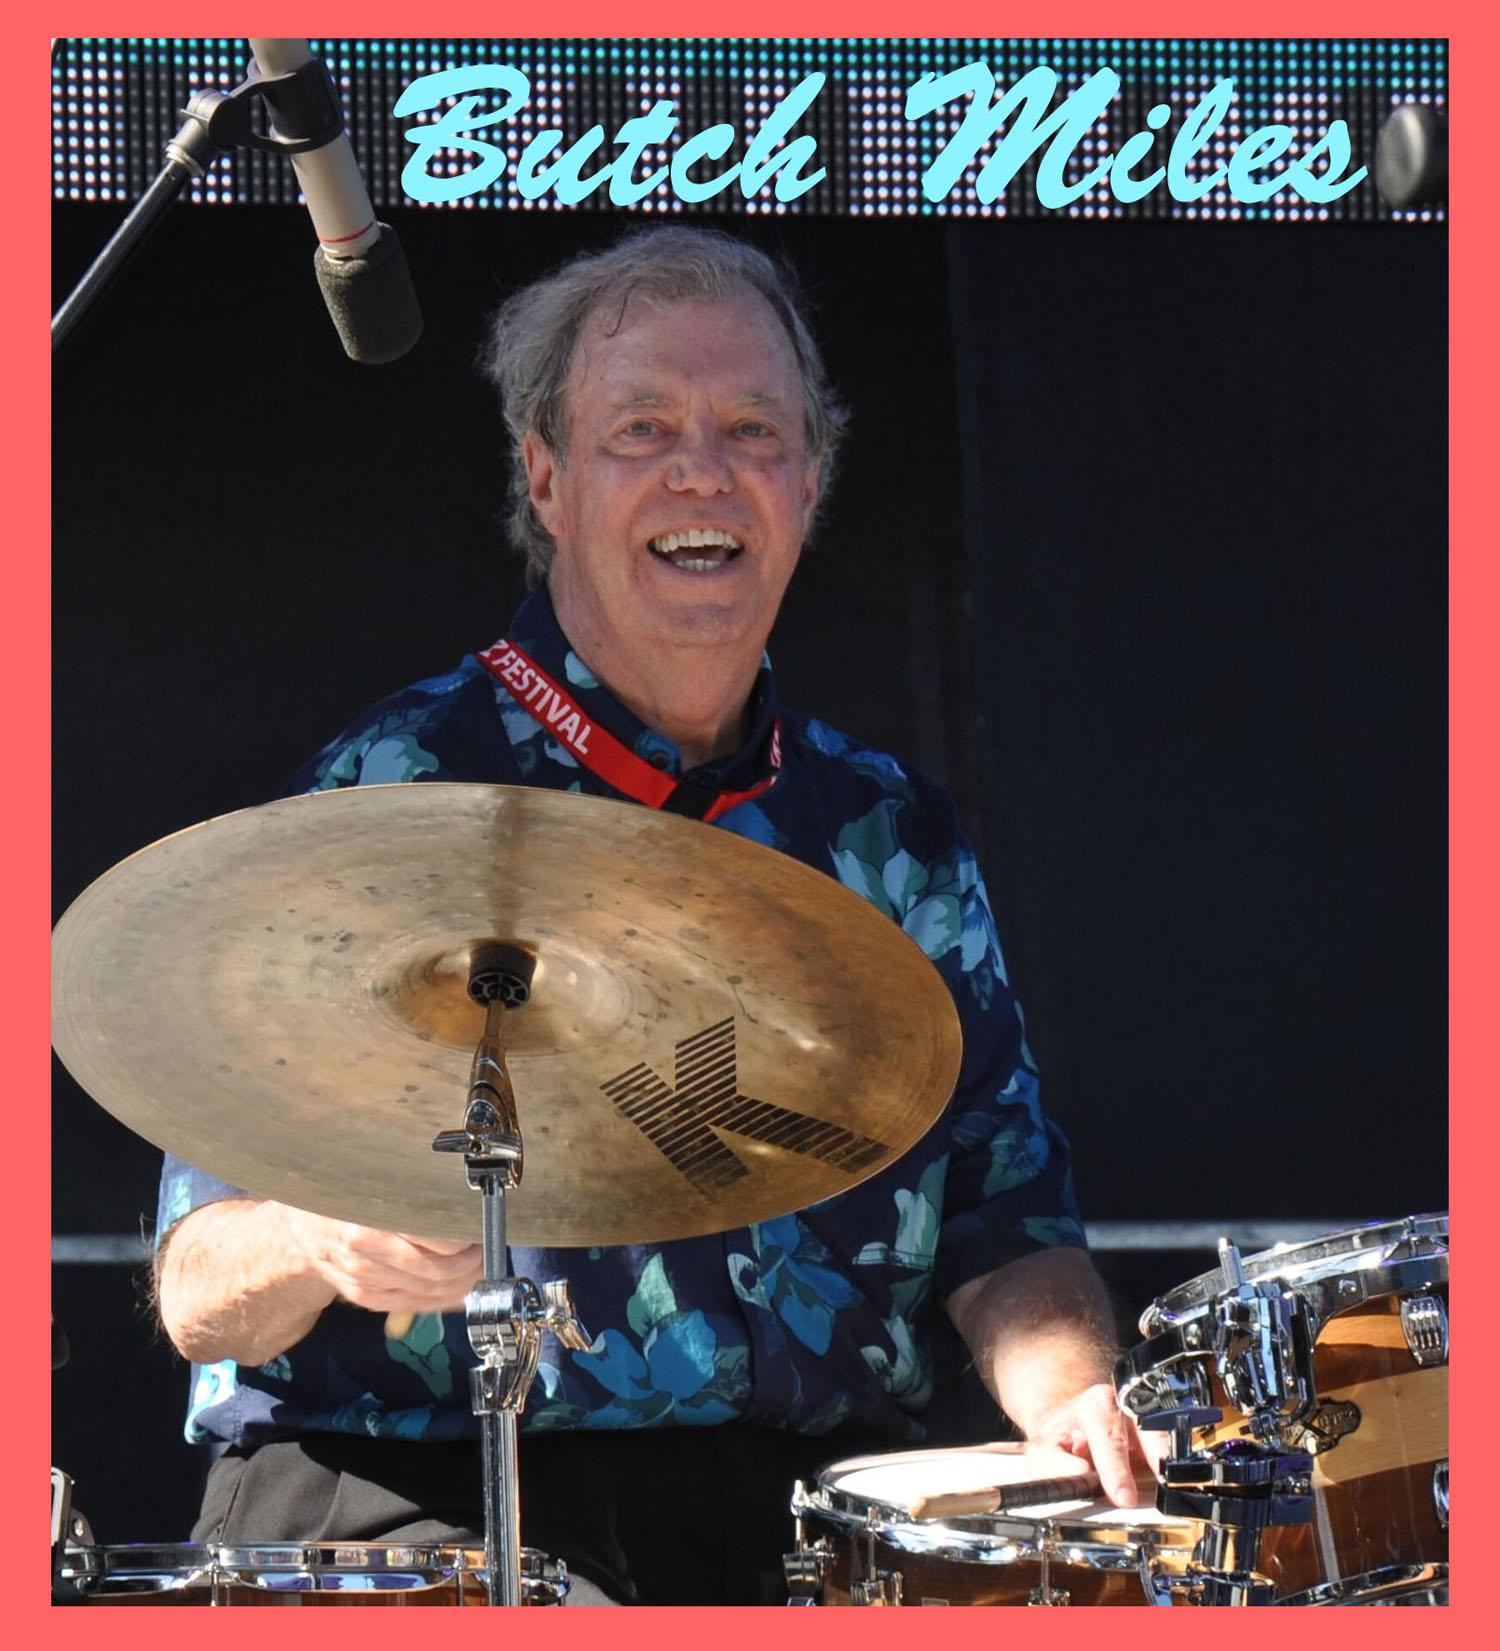 Pic-Butch-Miles.jpg